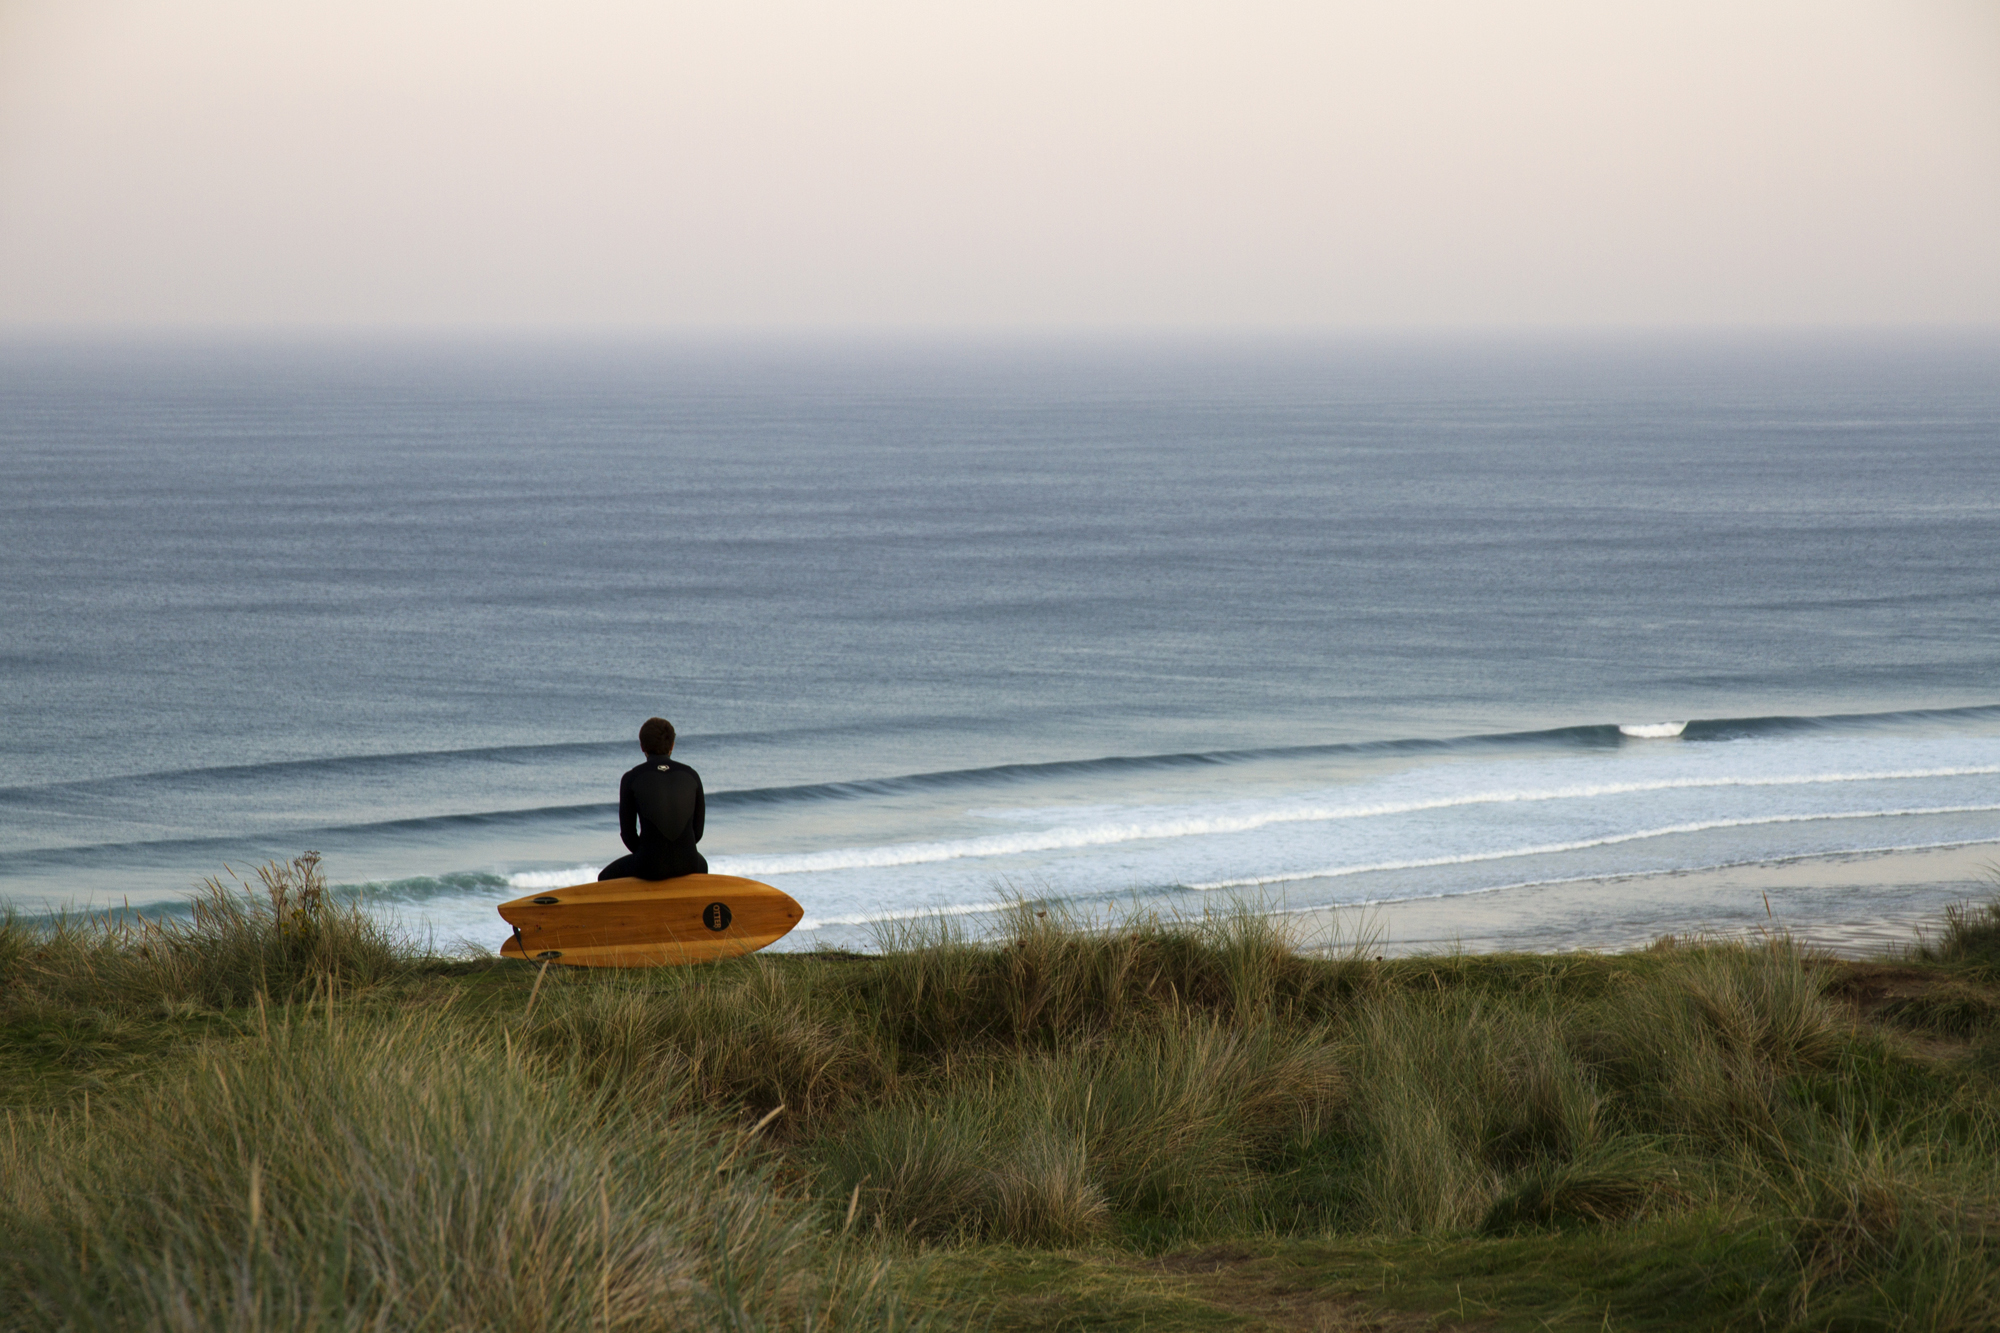 Otter_Surfboards_fish_dawn_surf_check.jpg